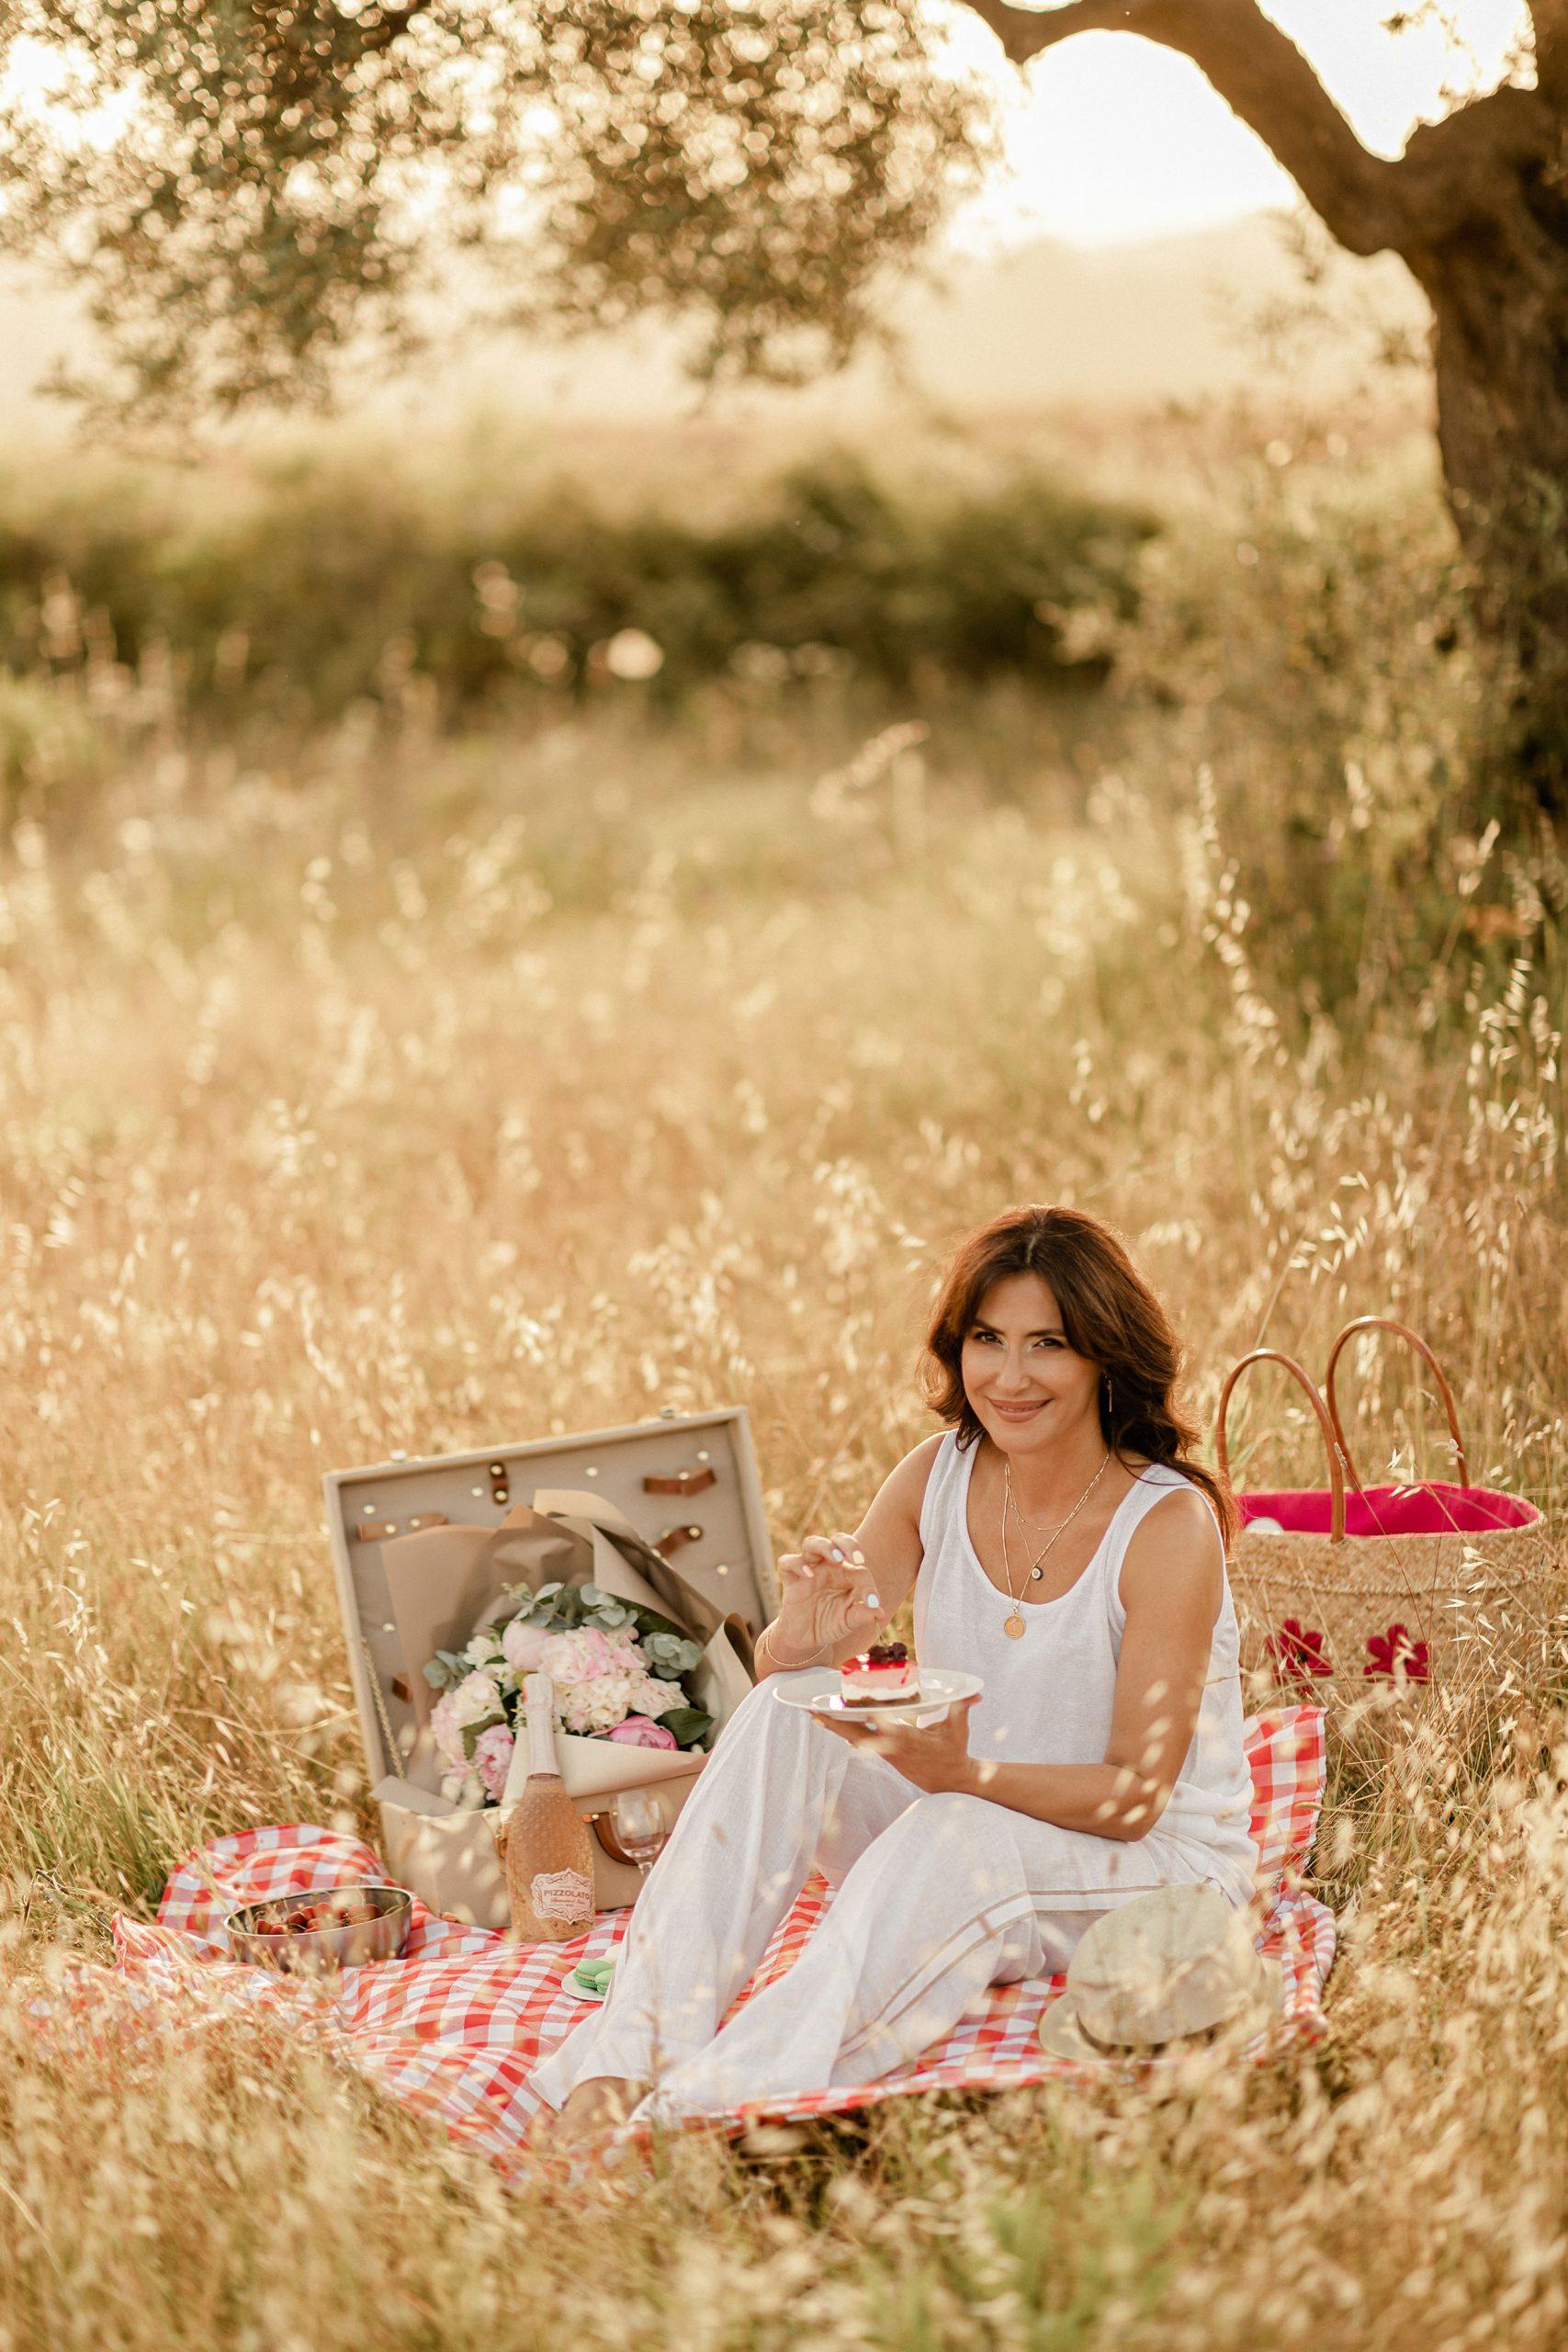 Summer picnic photo session